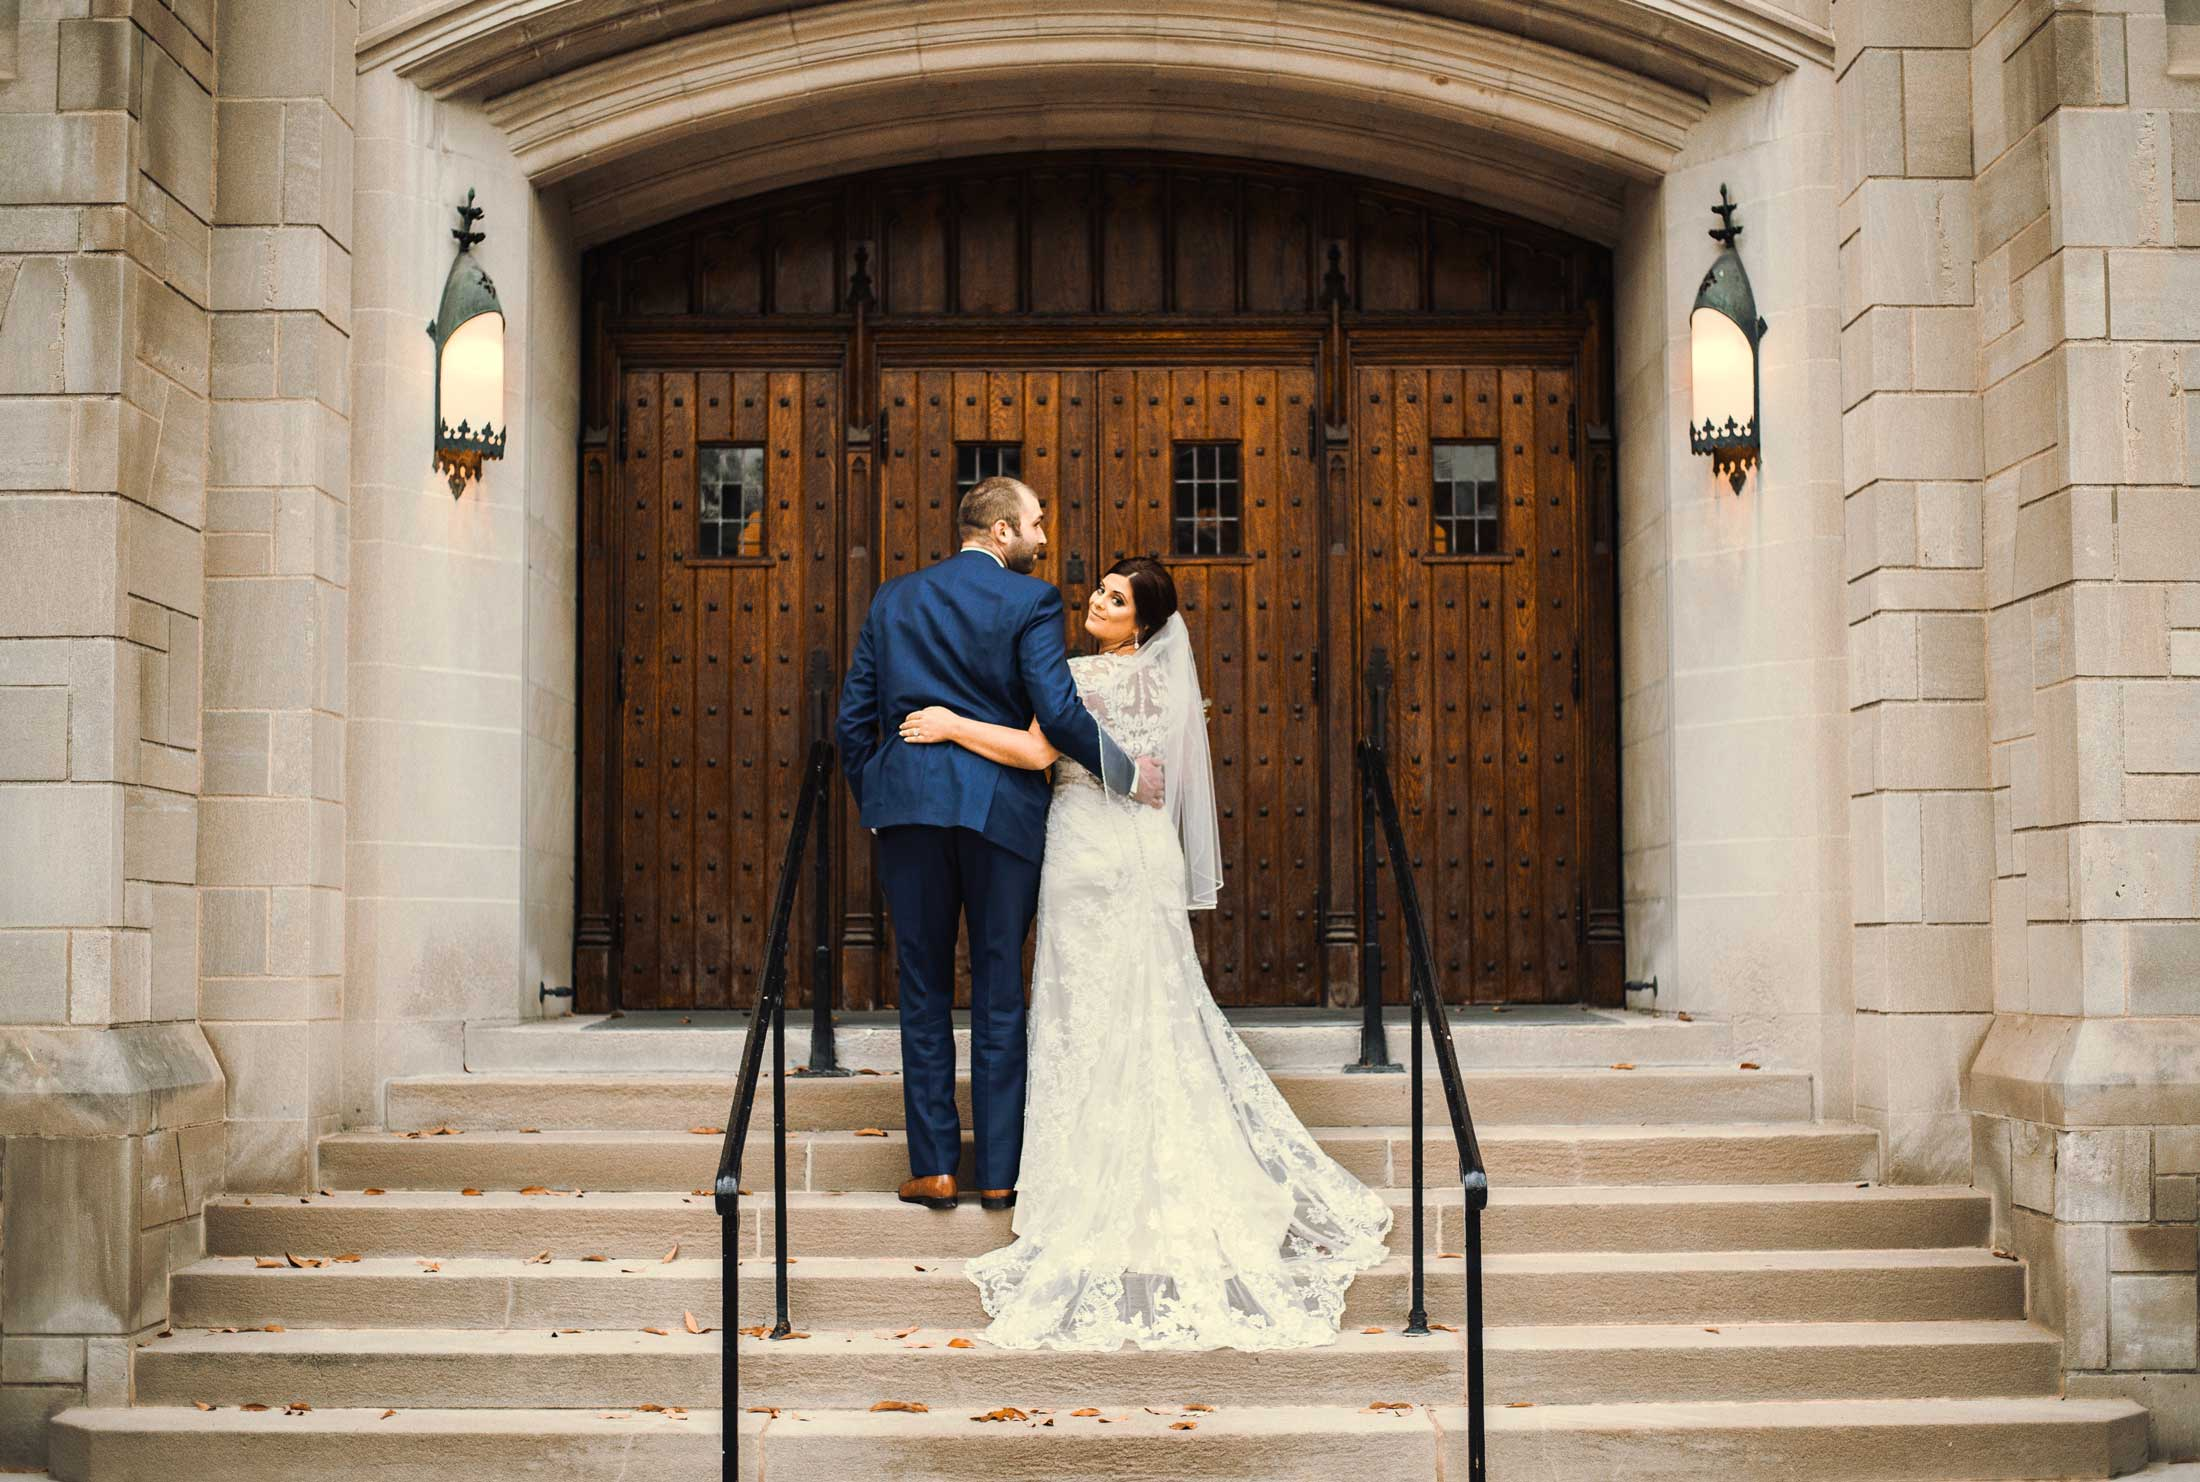 postponing-your-wedding-during-covid-19-16